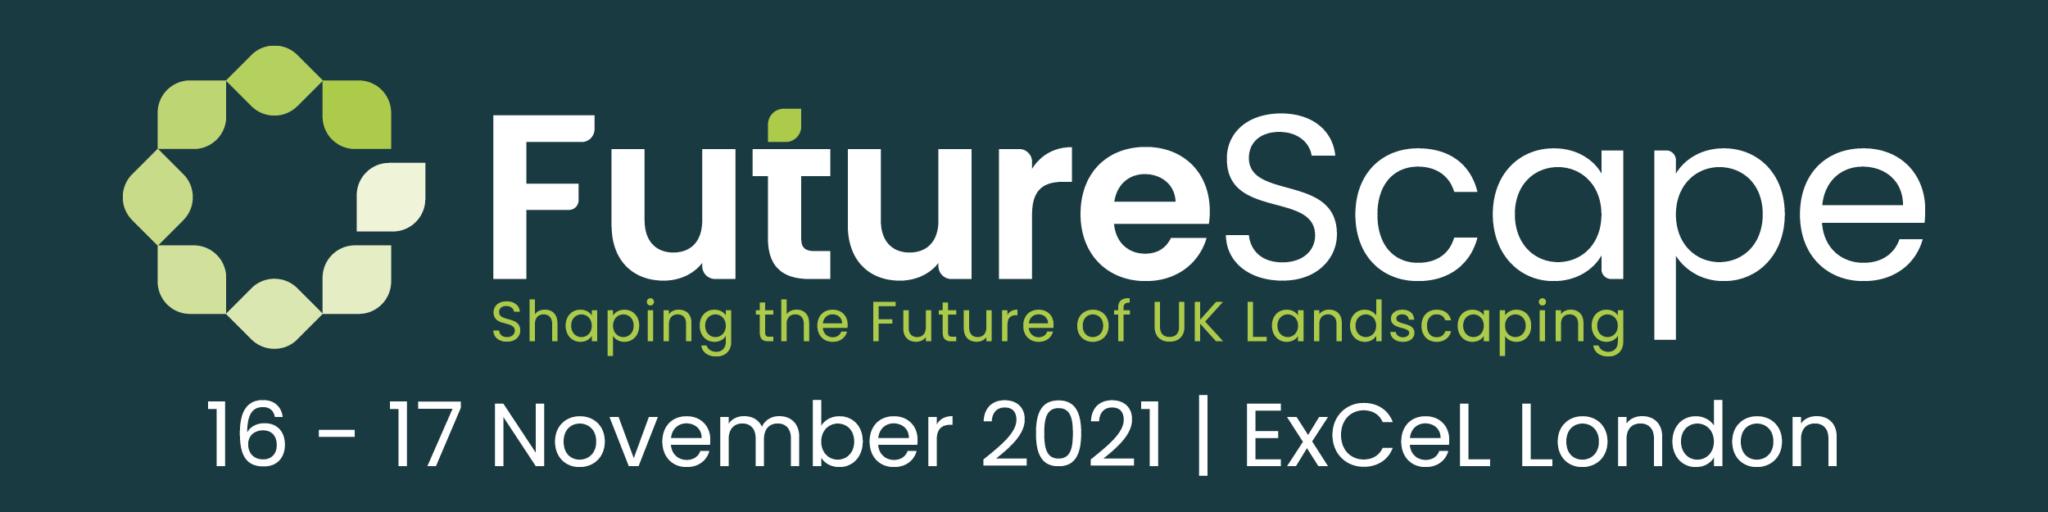 Westminster Stone @ FutureScape 2021